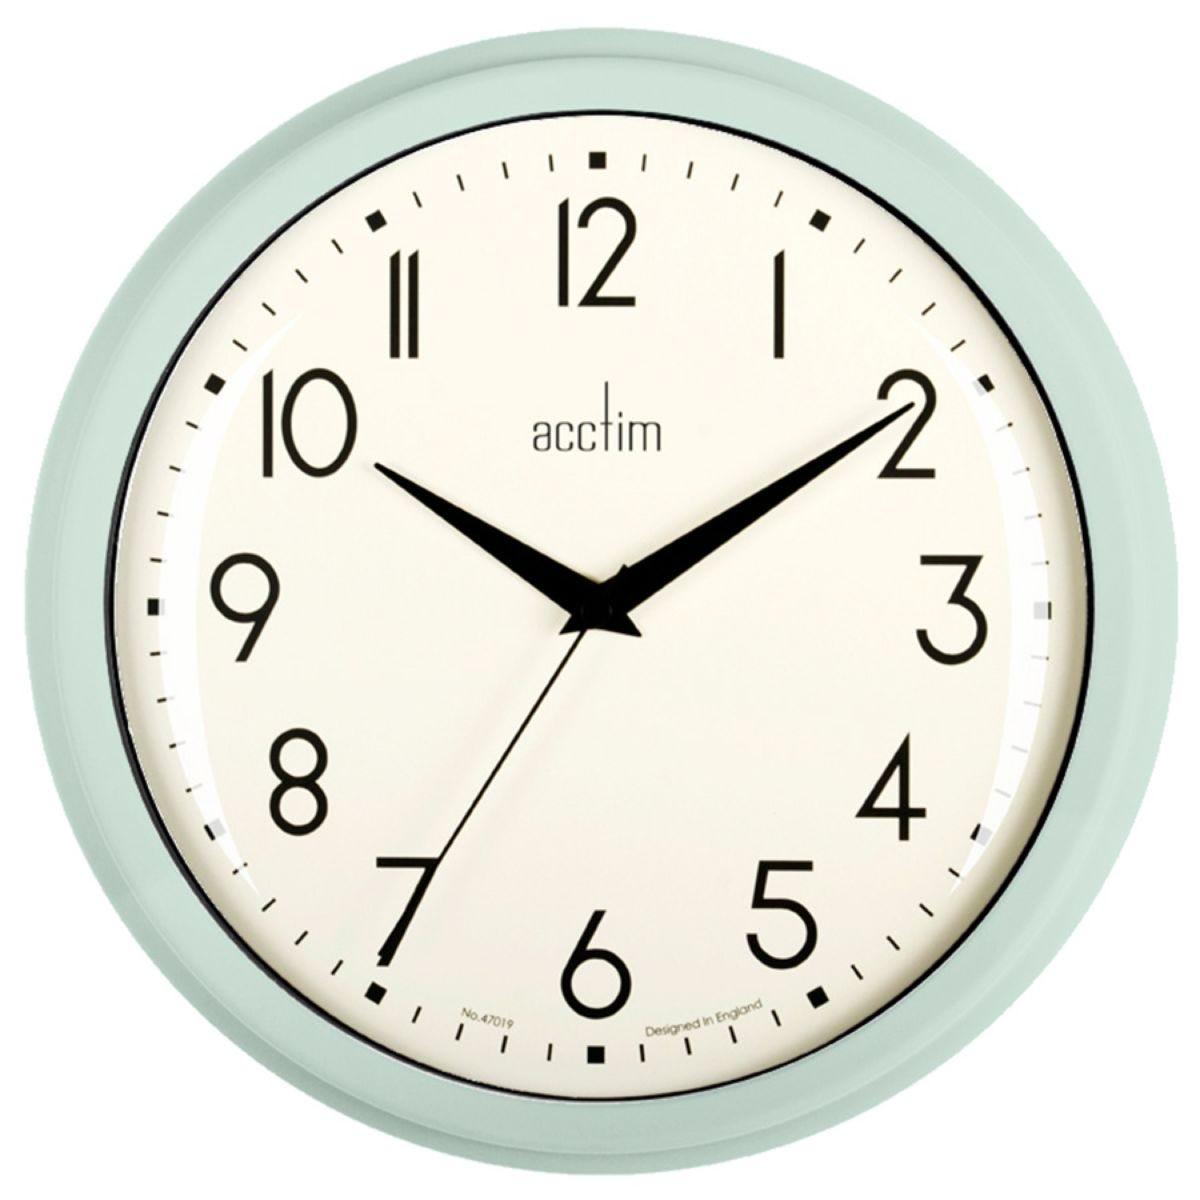 Acctim Elodie Retro Wall Clock - Mint